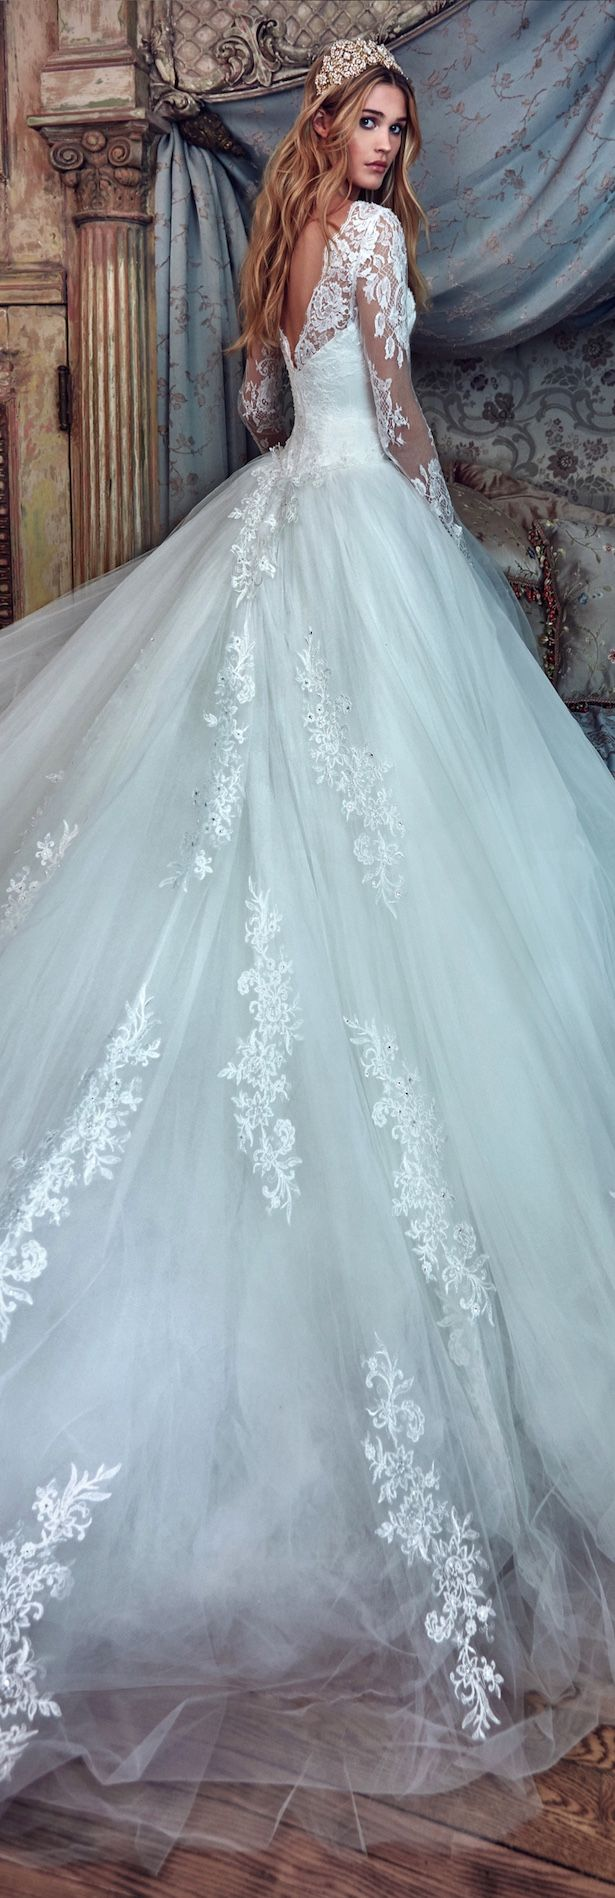 Beautiful Wedding Dress Dry Cleaners Vignette - All Wedding Dresses ...